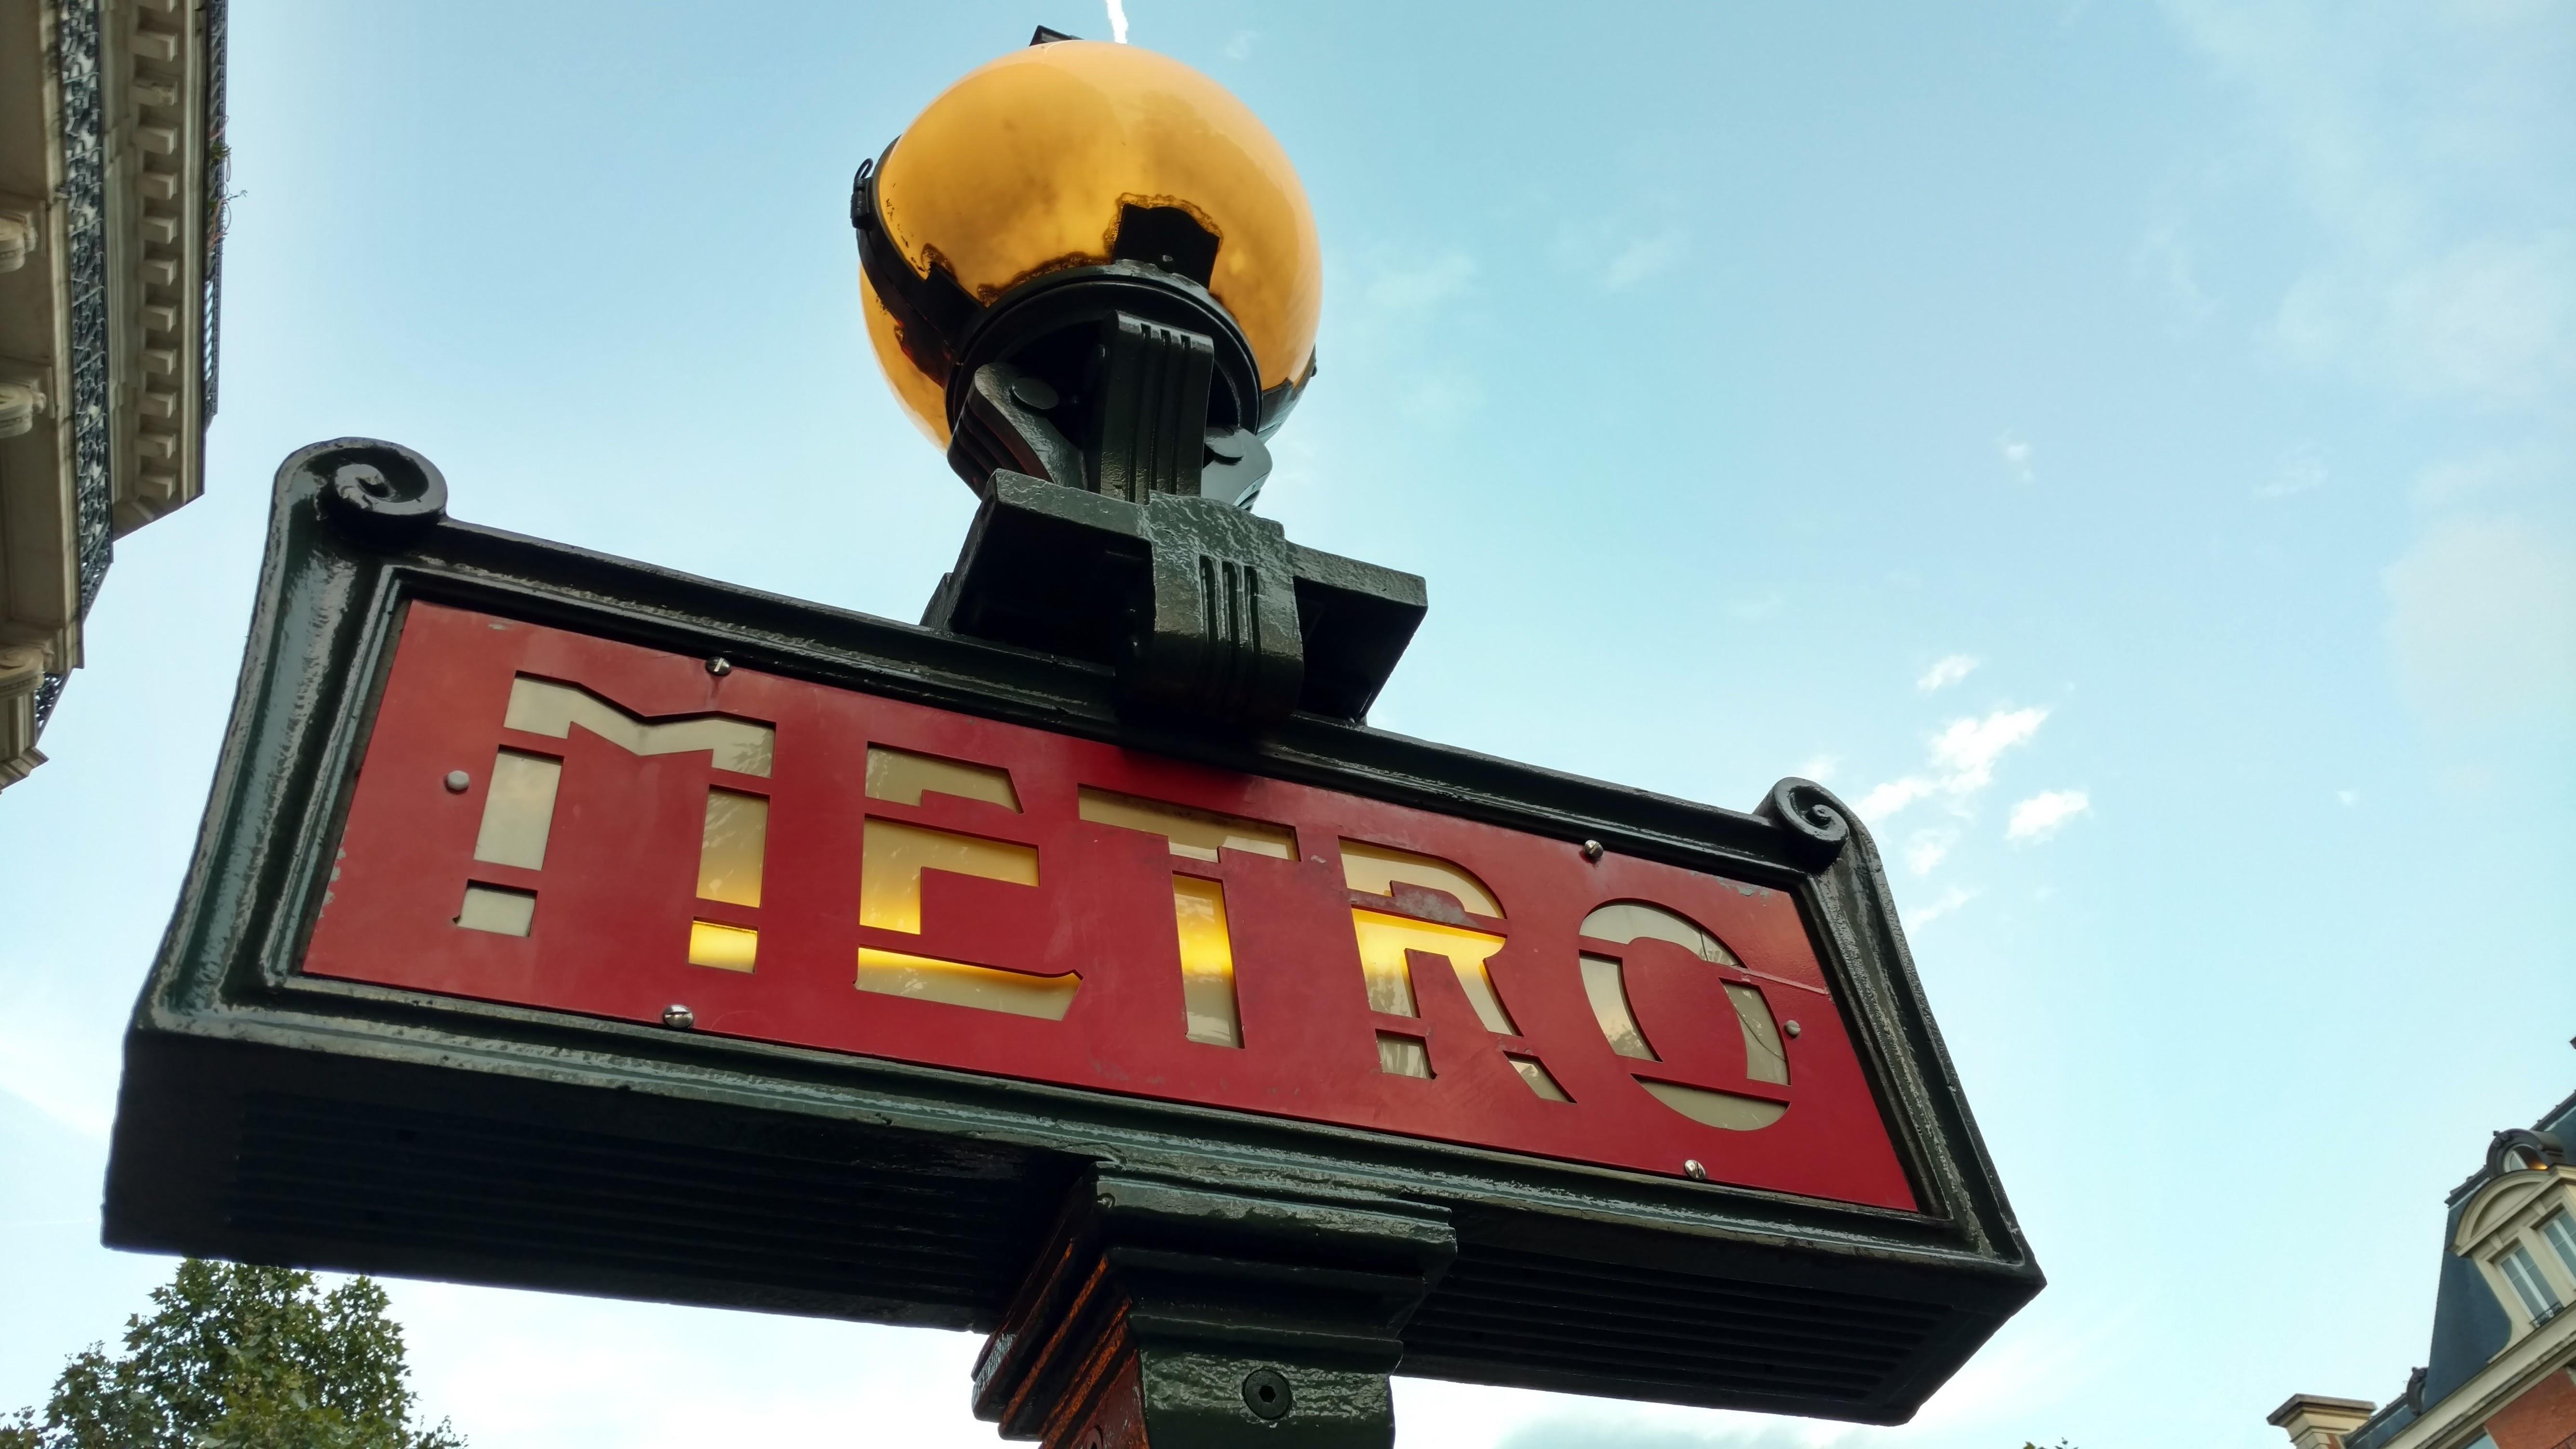 Metro Sign